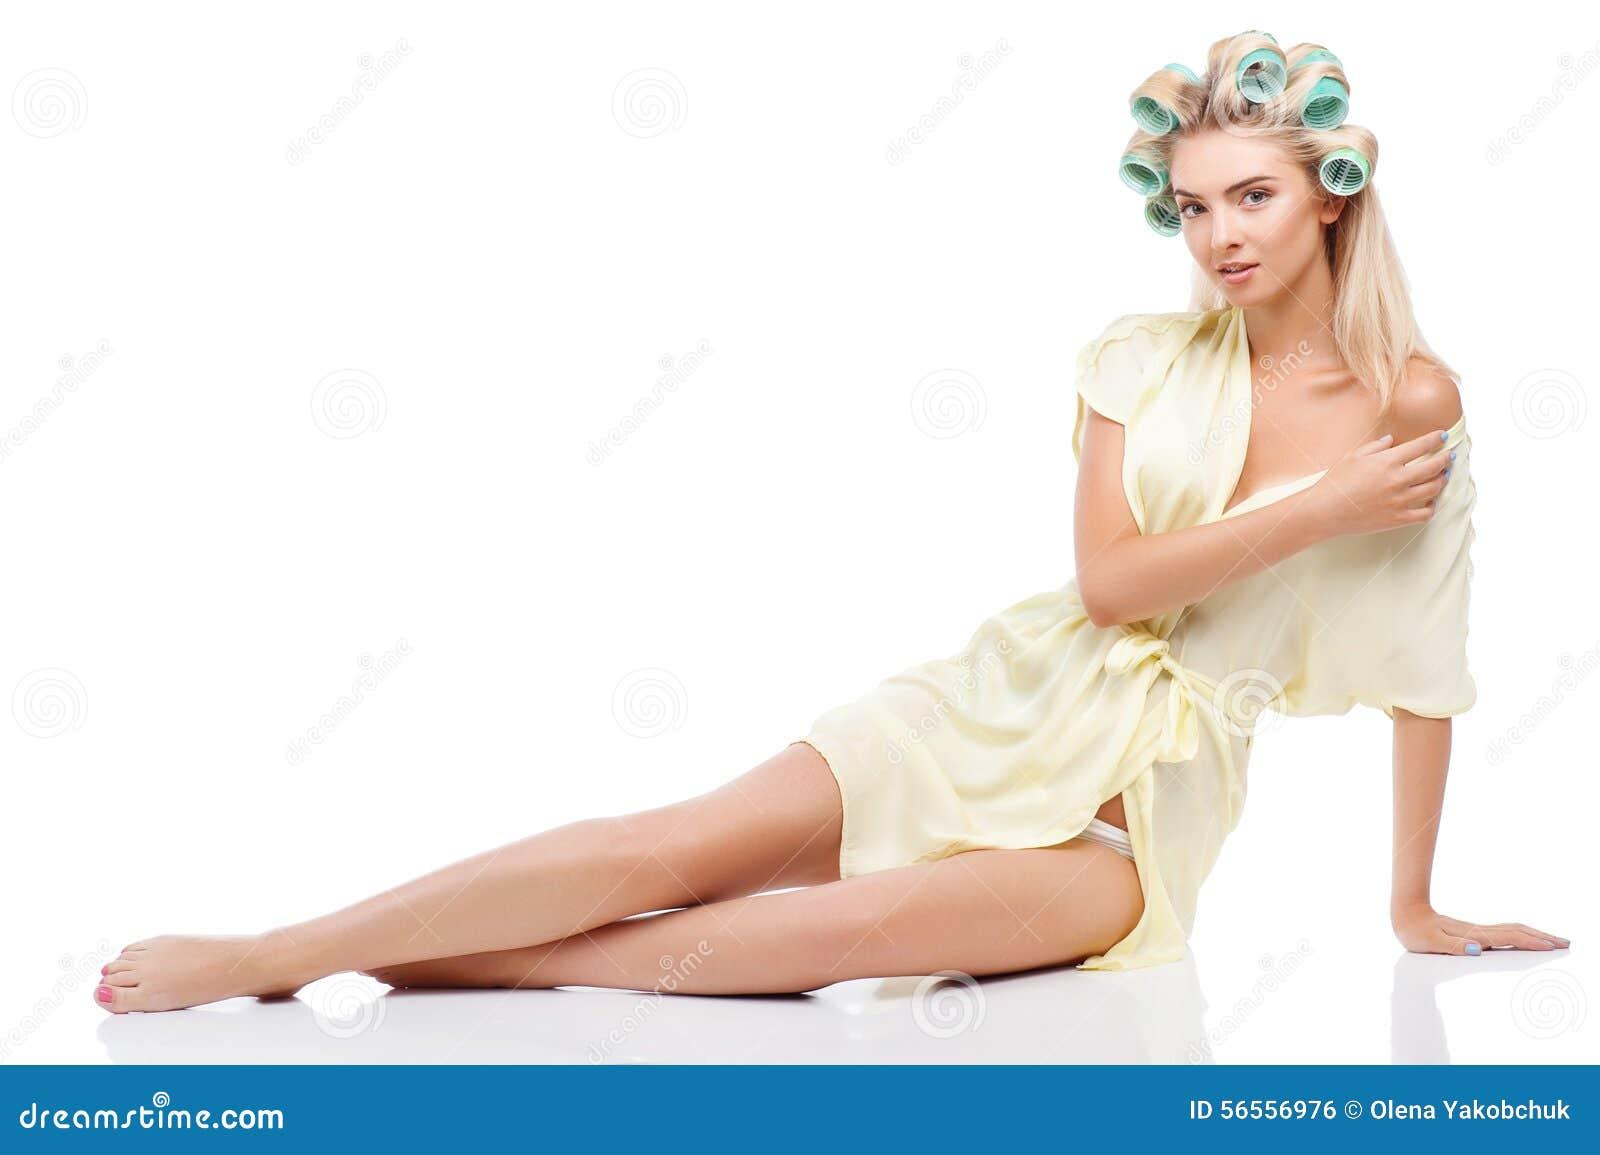 Download Η ελκυστική νέα νοικοκυρά παραπλανεί το σύζυγό της Στοκ Εικόνες - εικόνα από μοντέλο, ένας: 56556976